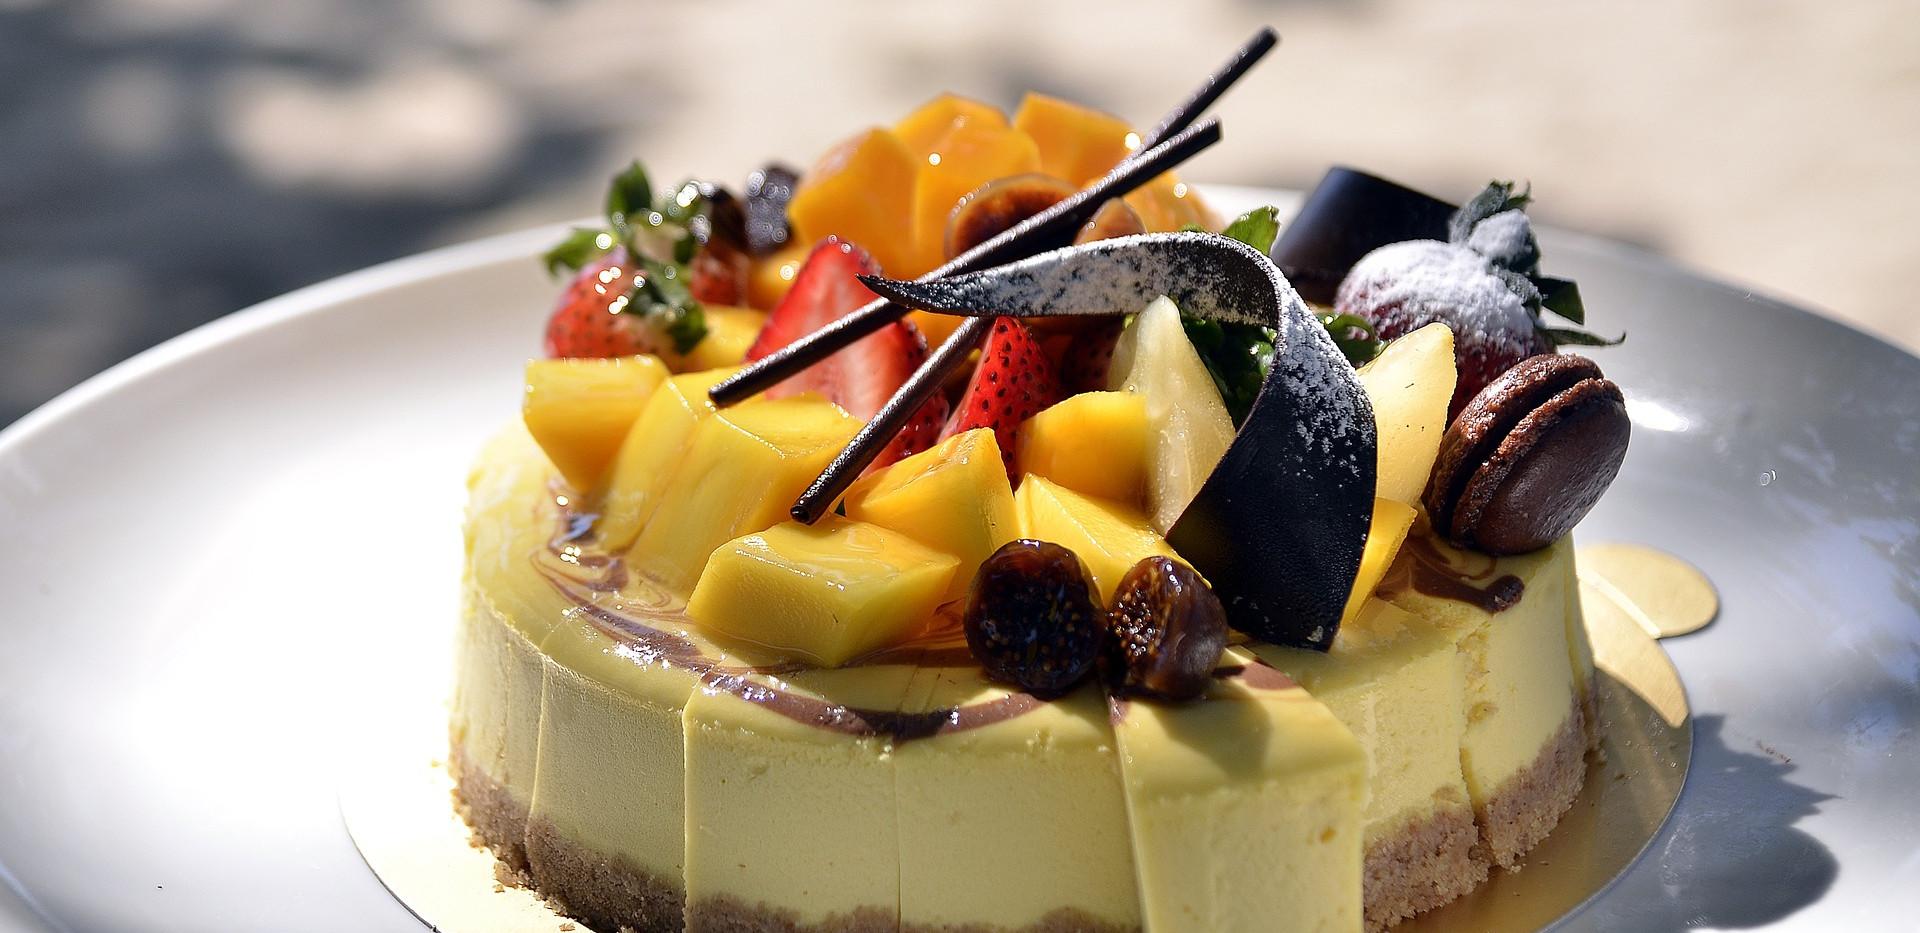 cake-1284548_1920.jpg